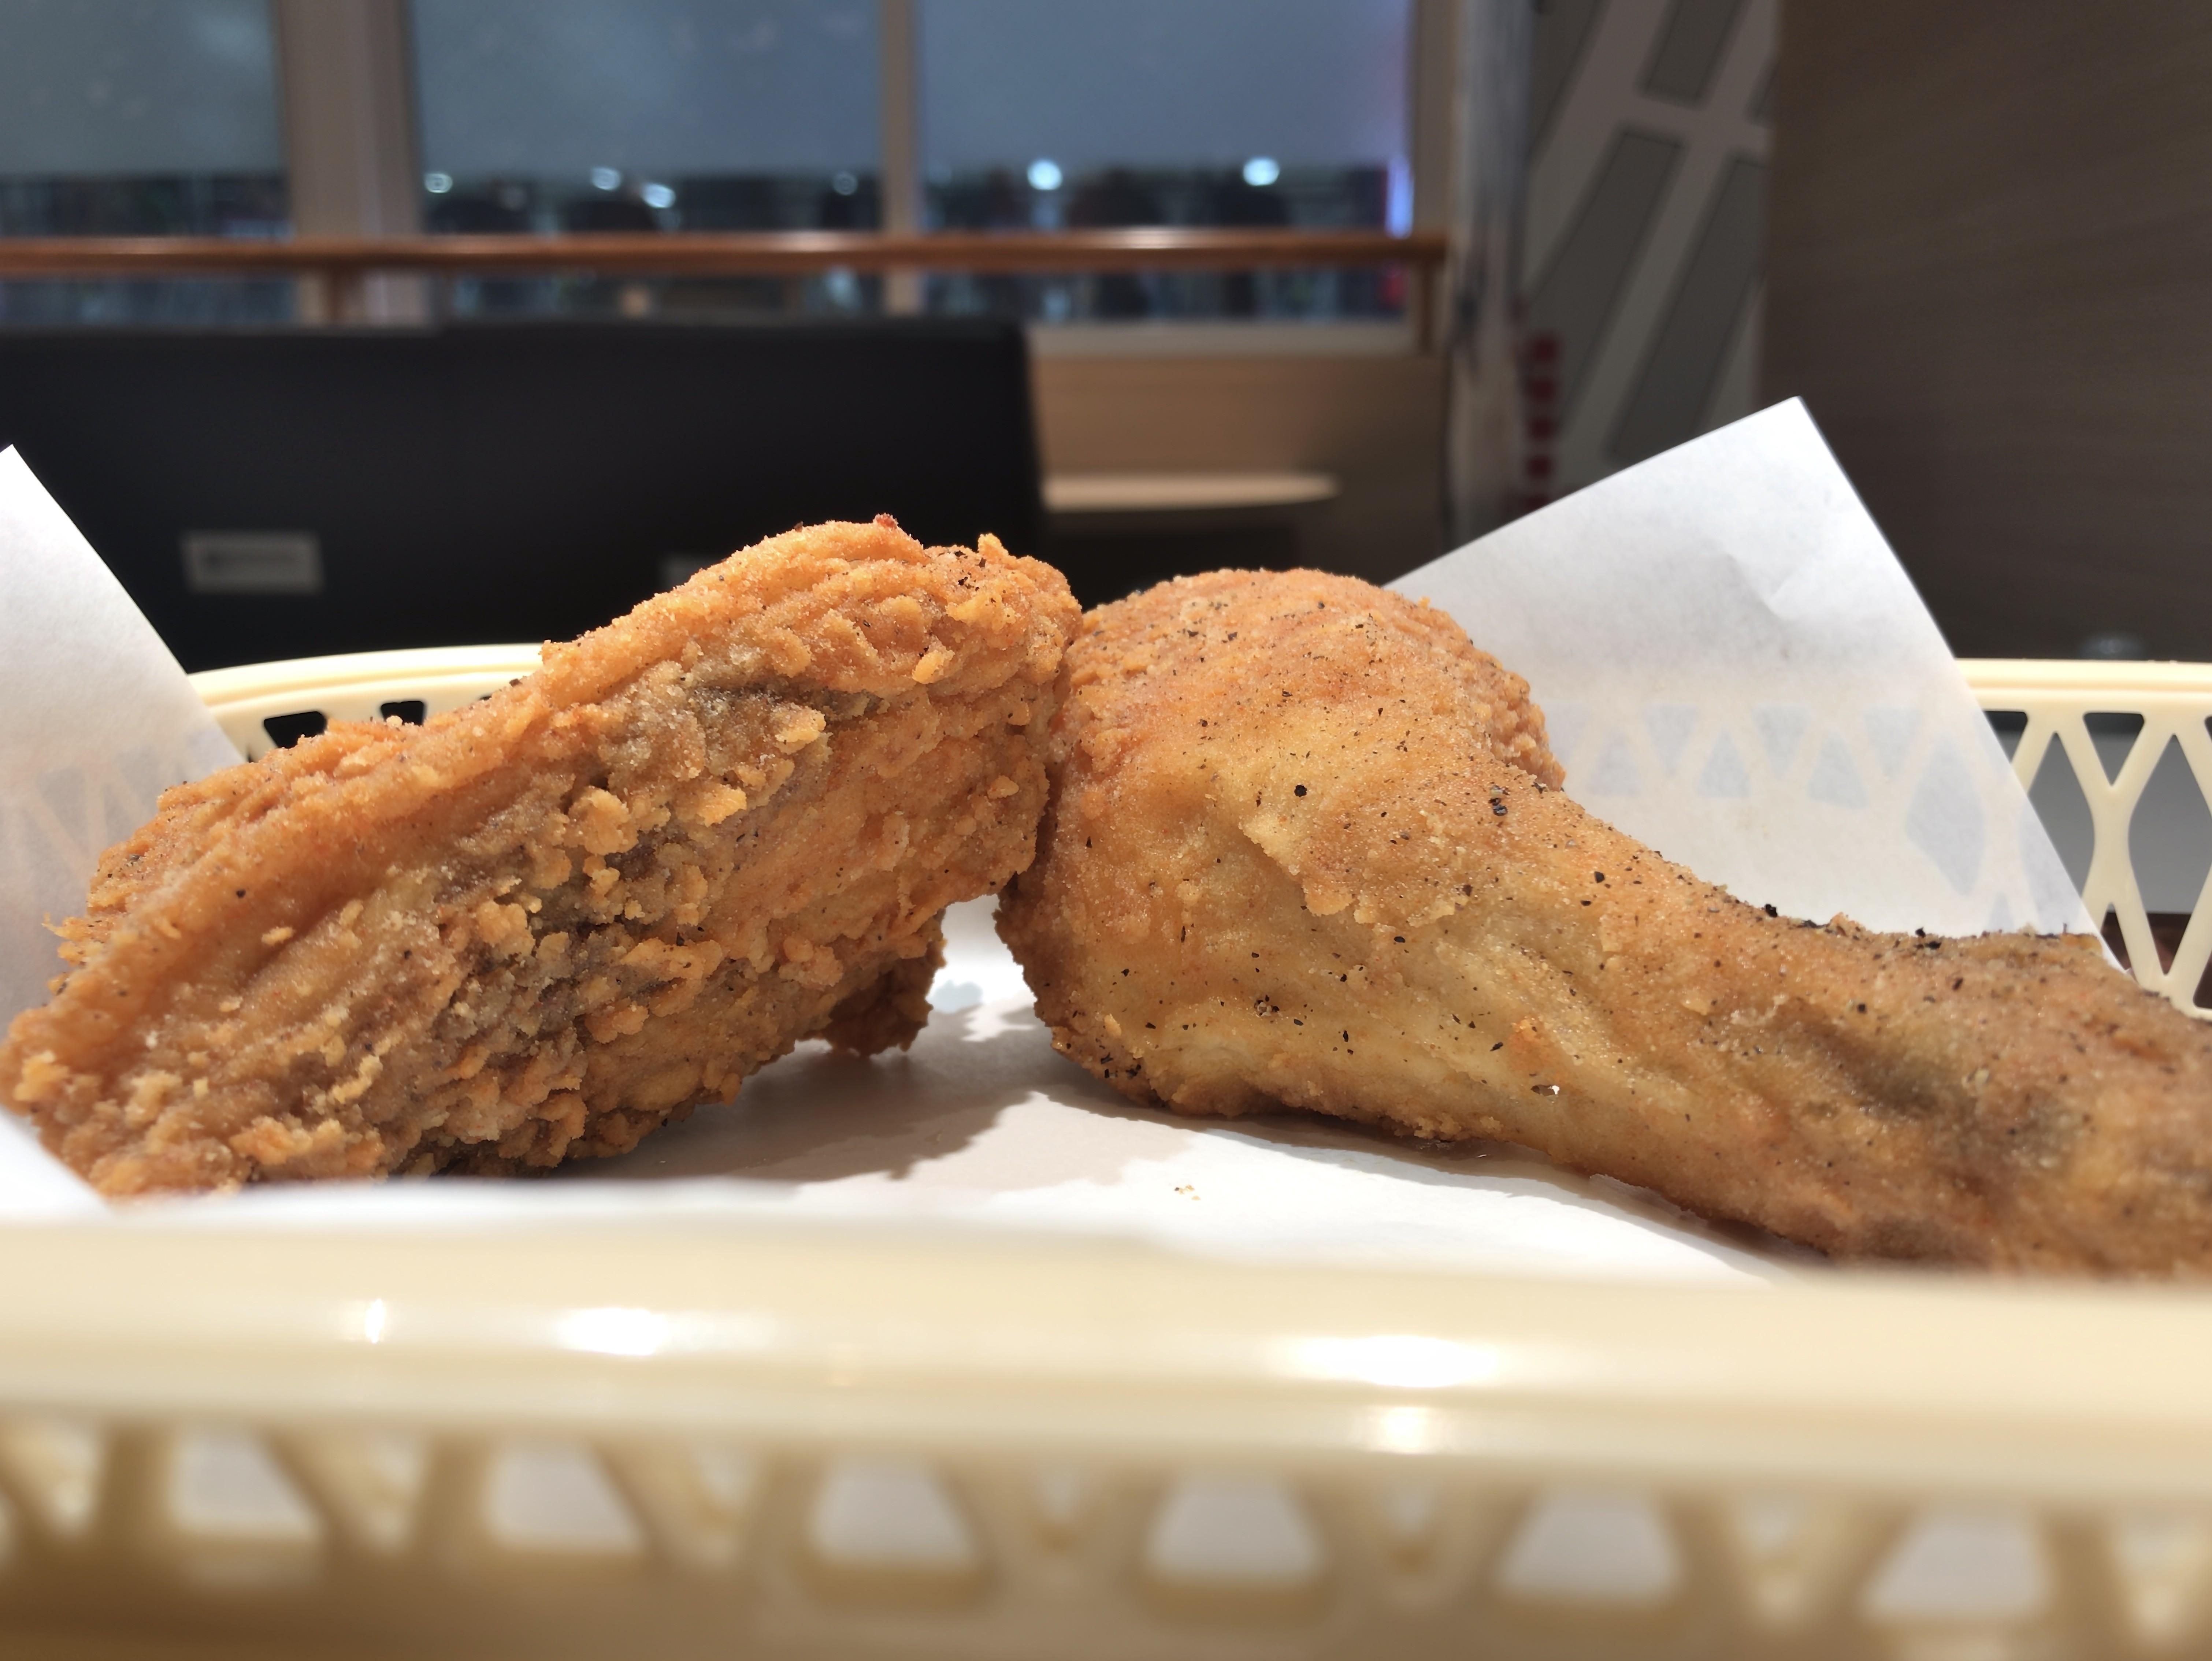 [KFC][あら挽き黒胡椒チキン][税込み270円][231kcal]